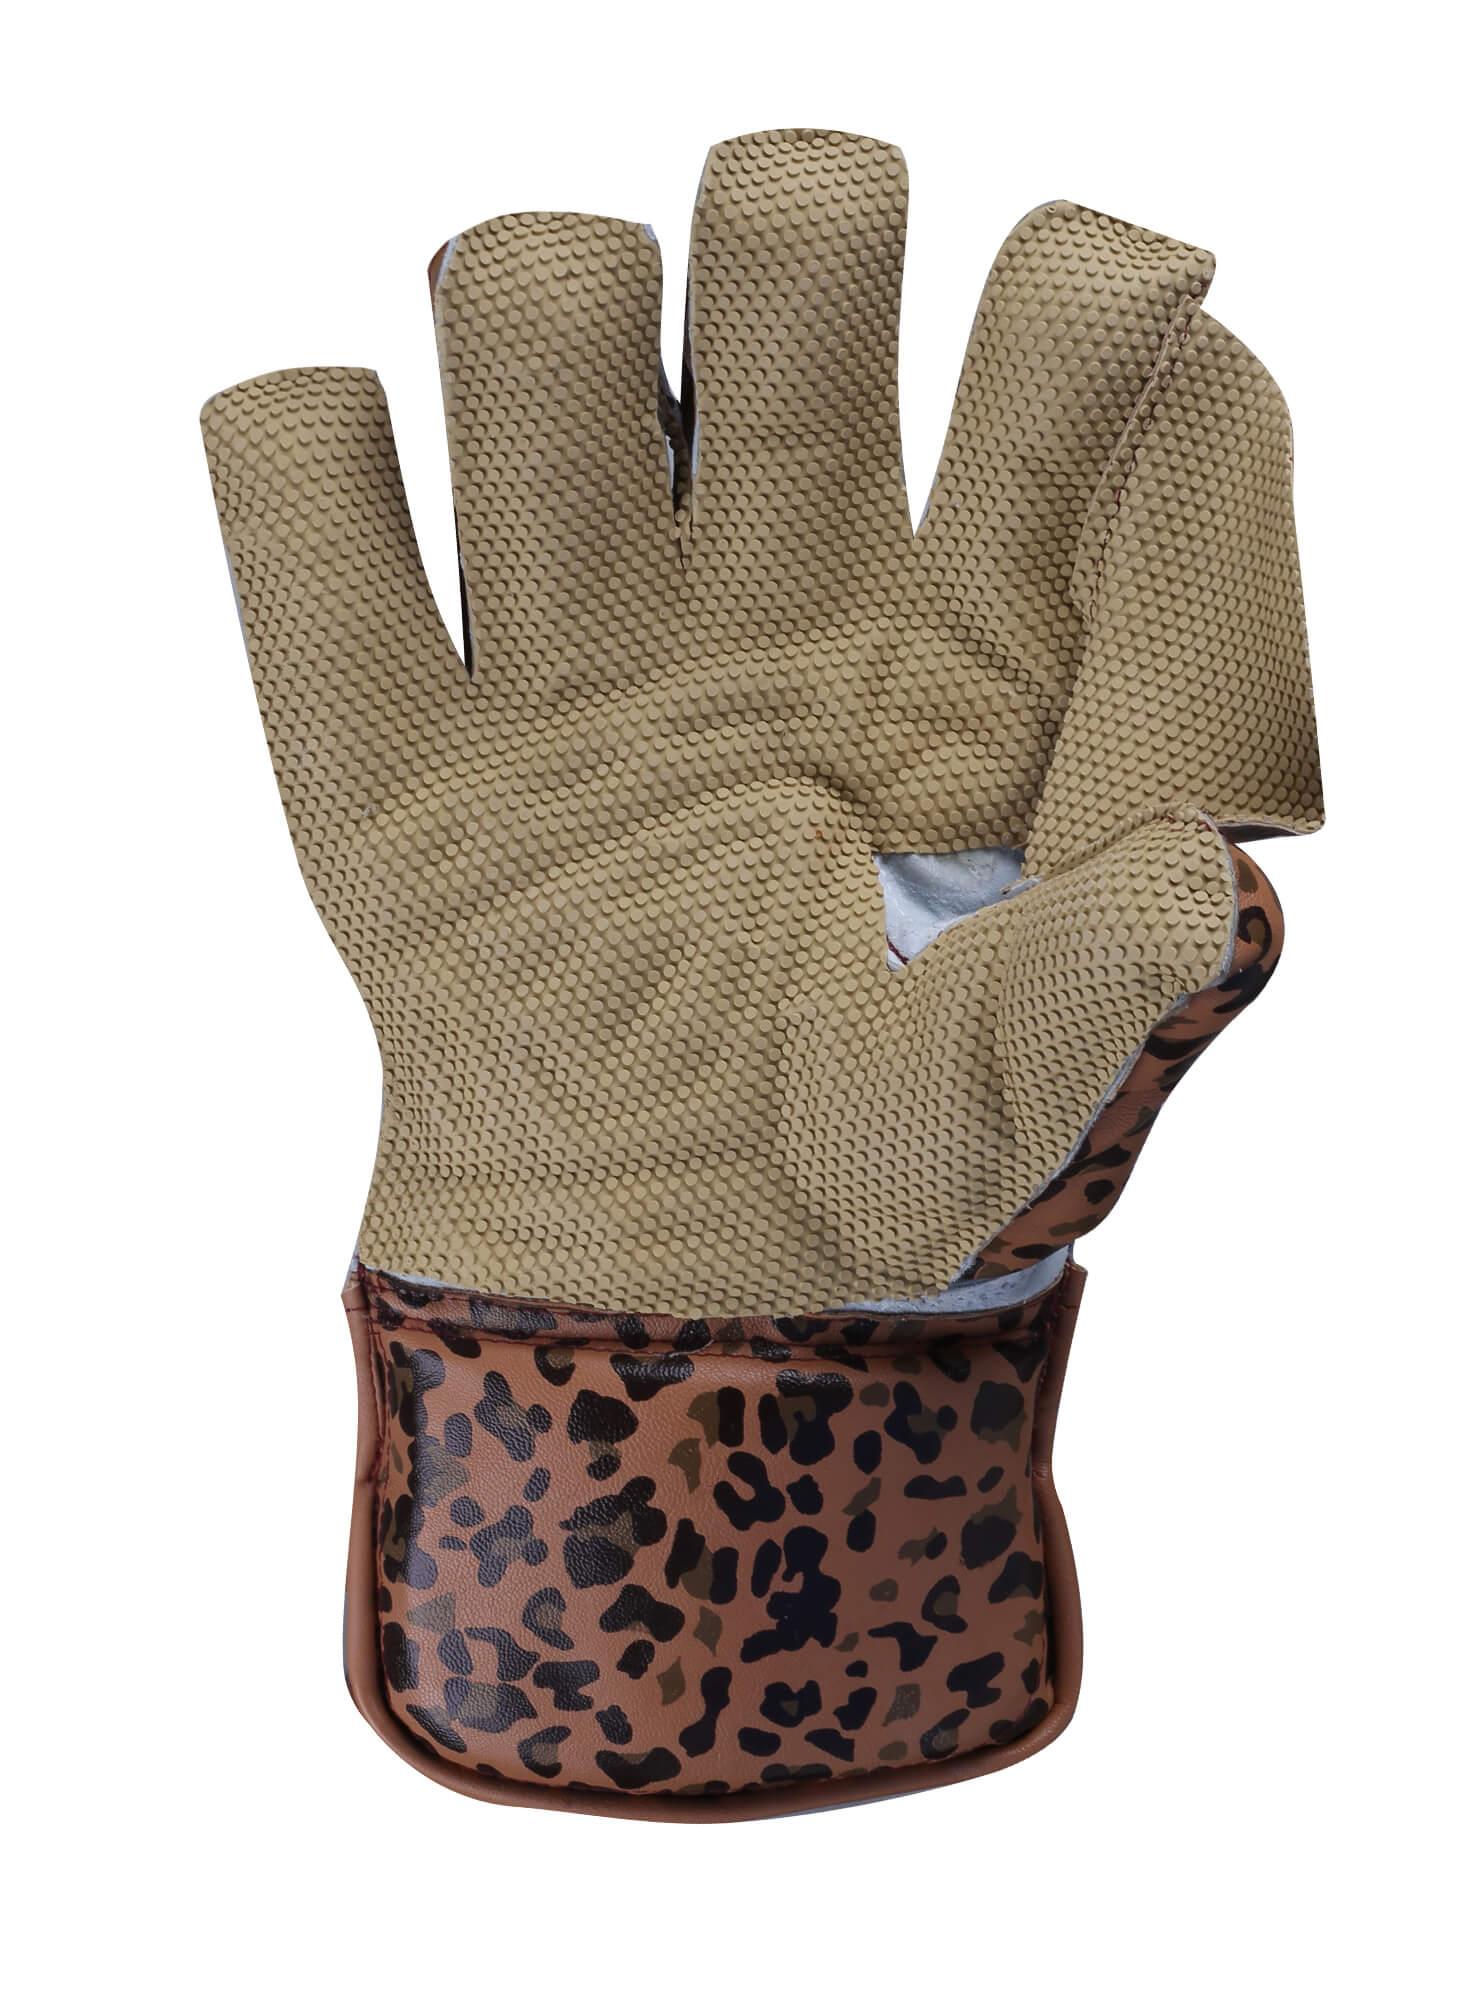 wicket keeping glove